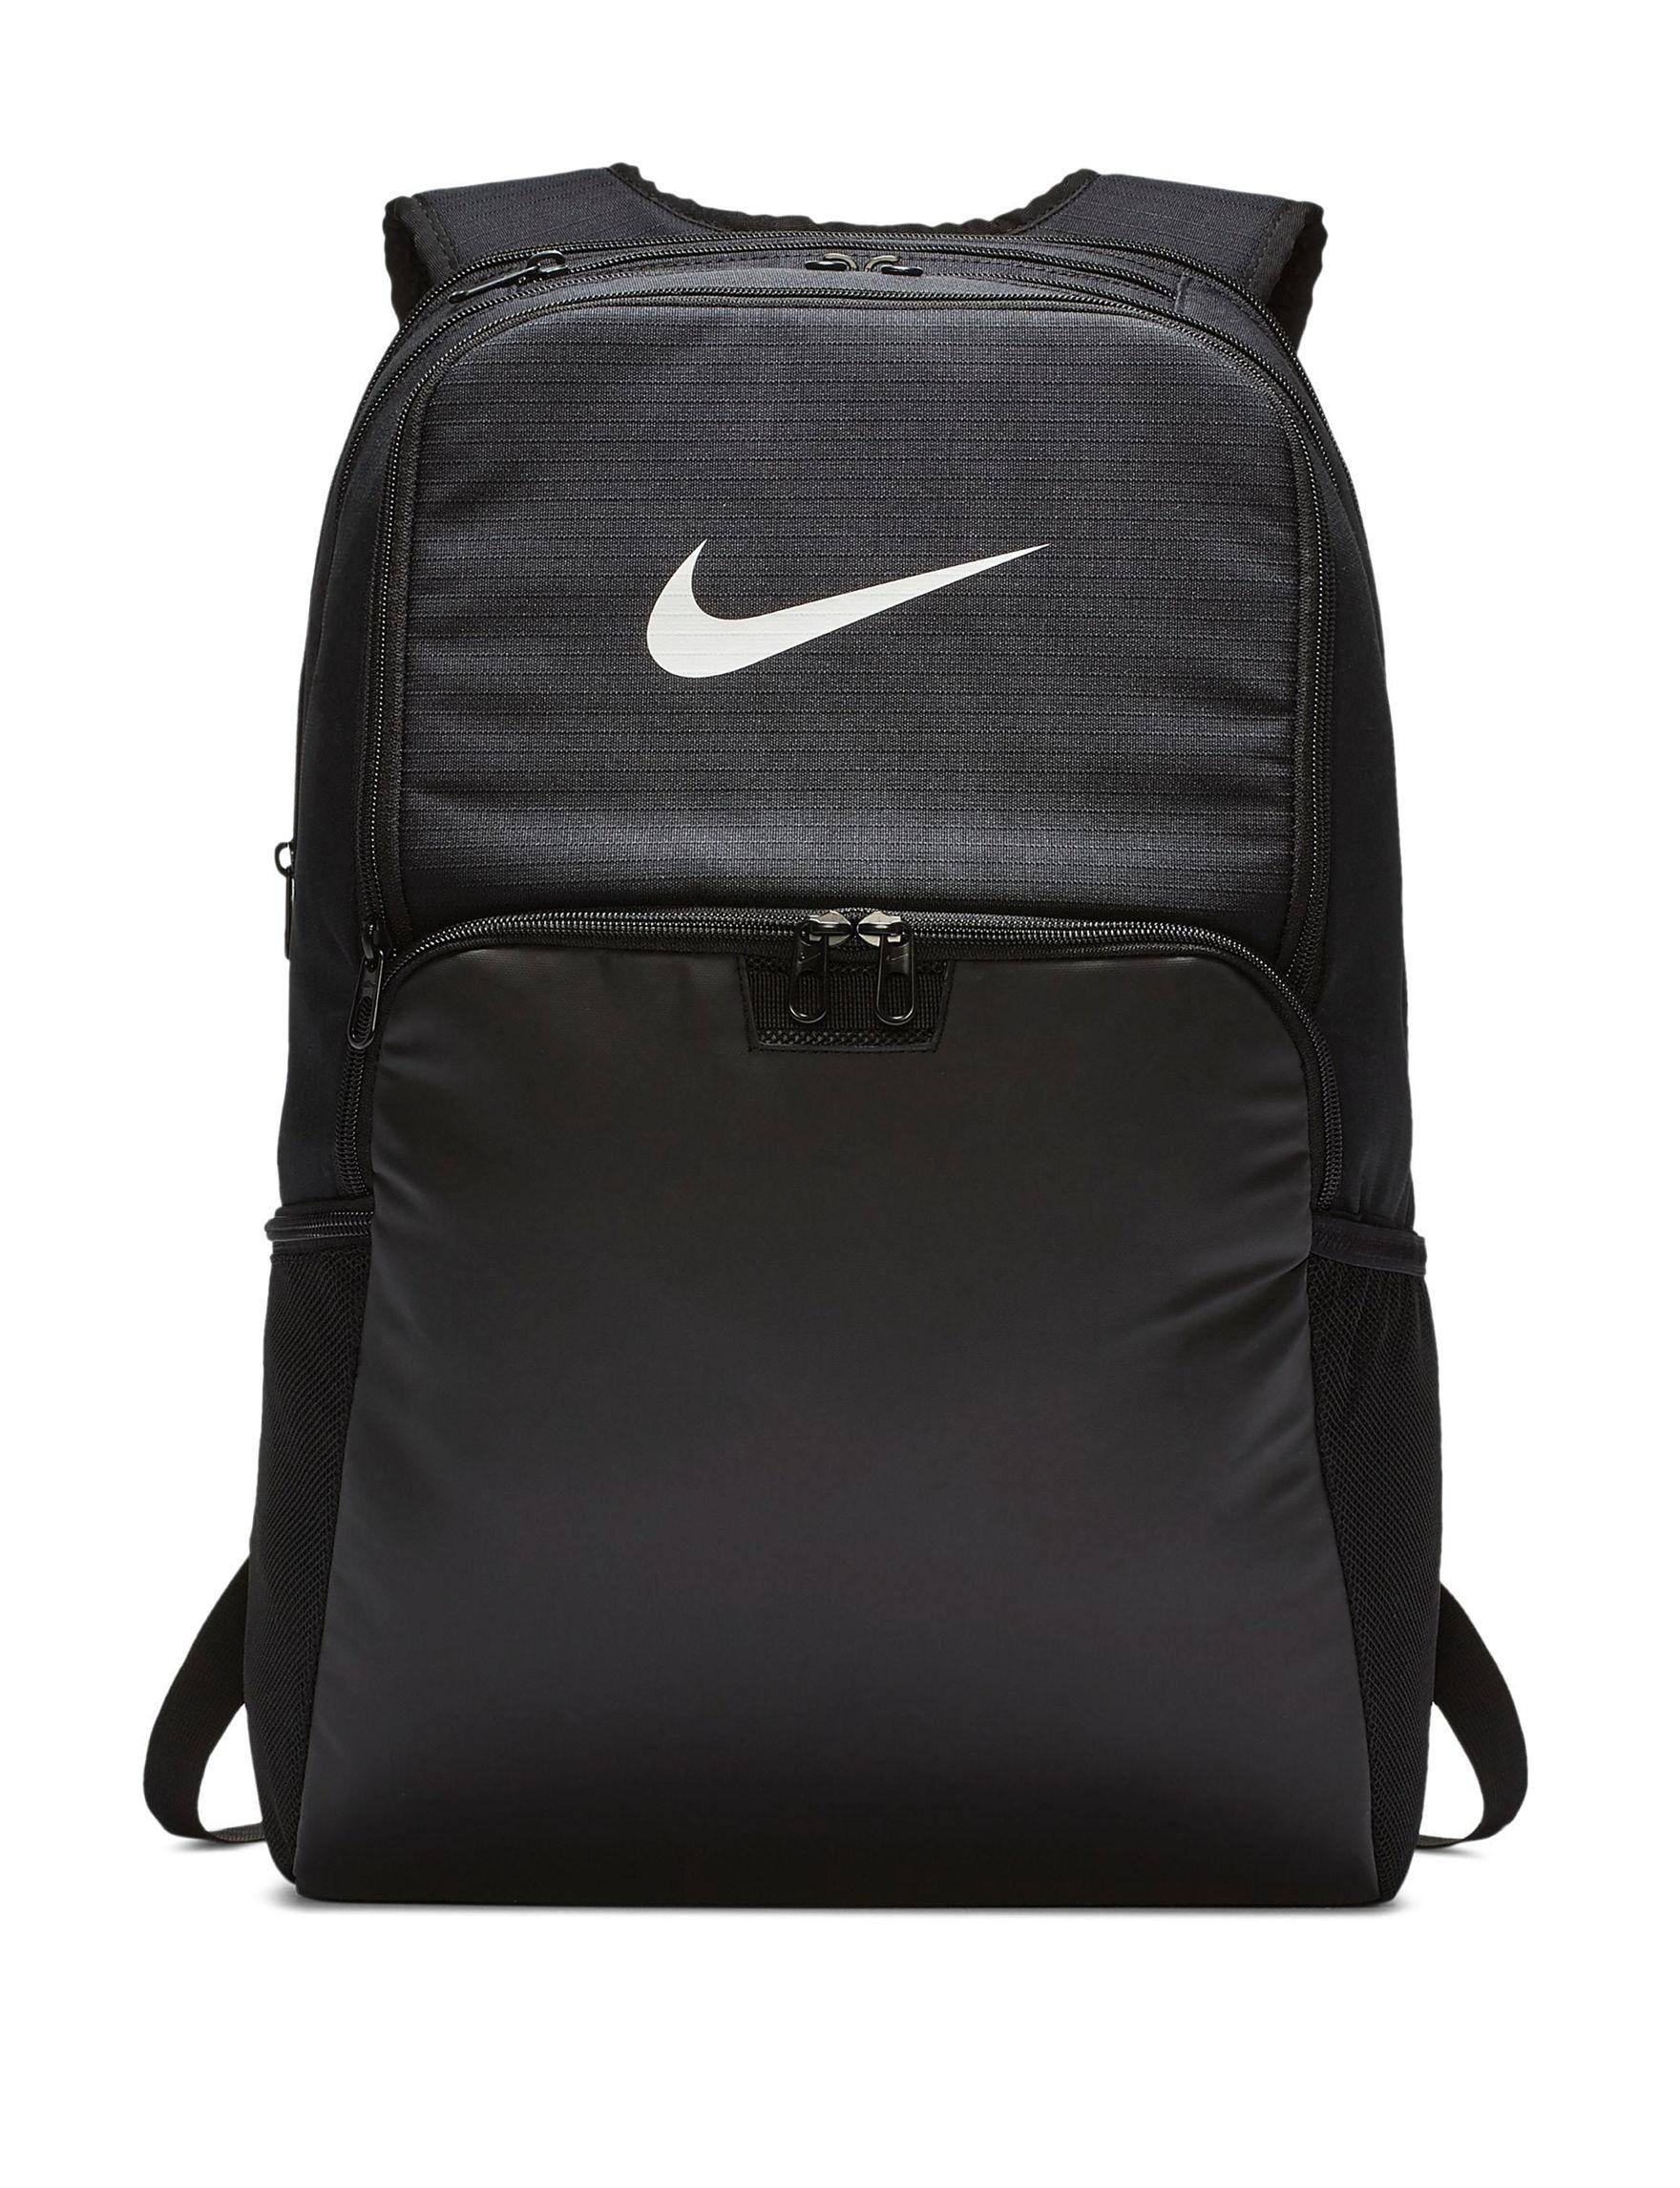 Nike Black Bookbags & Backpacks